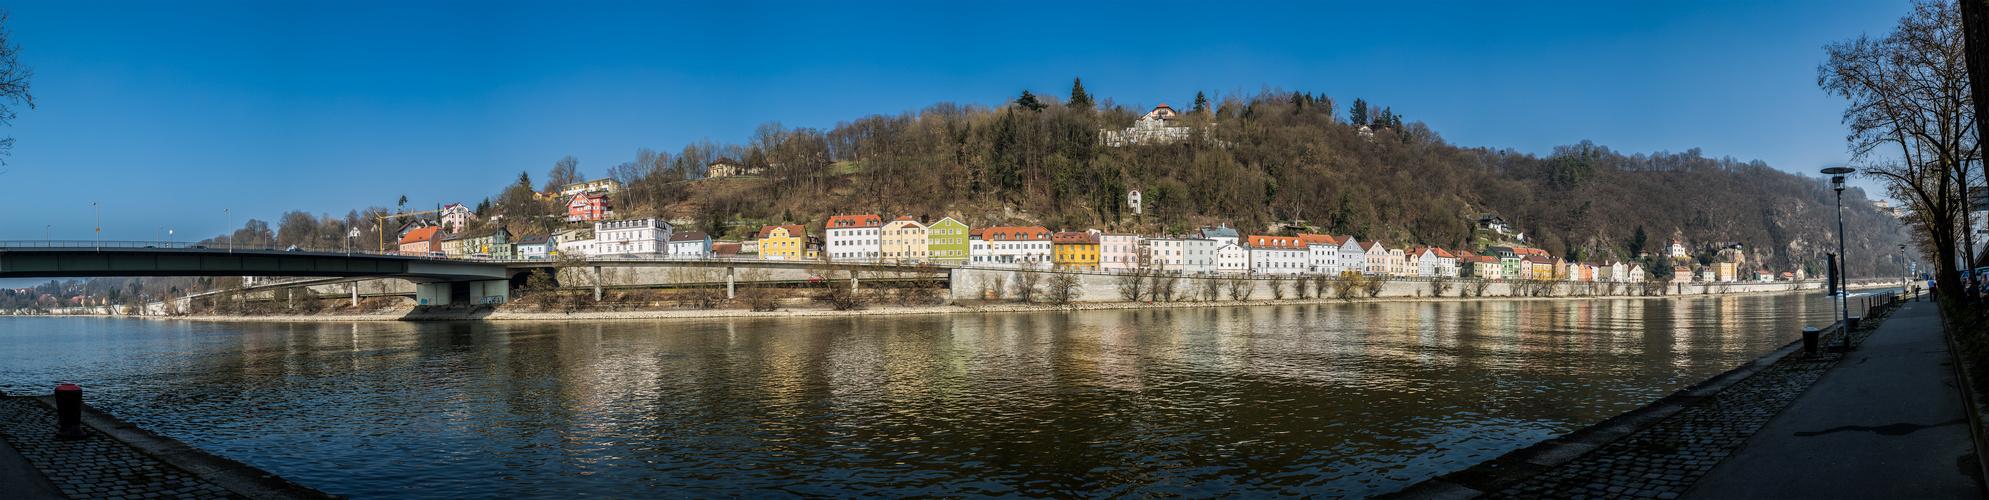 Donaublick Passau